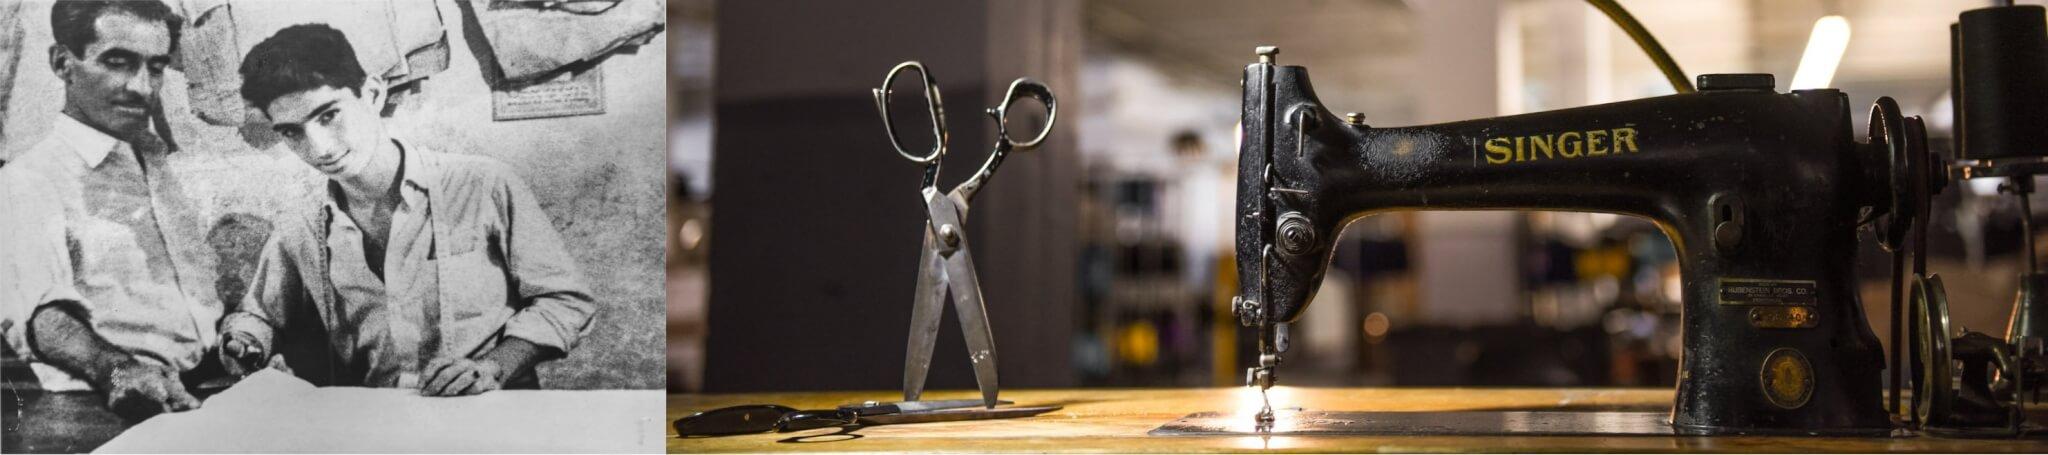 machine-scissors-lg-narrow2